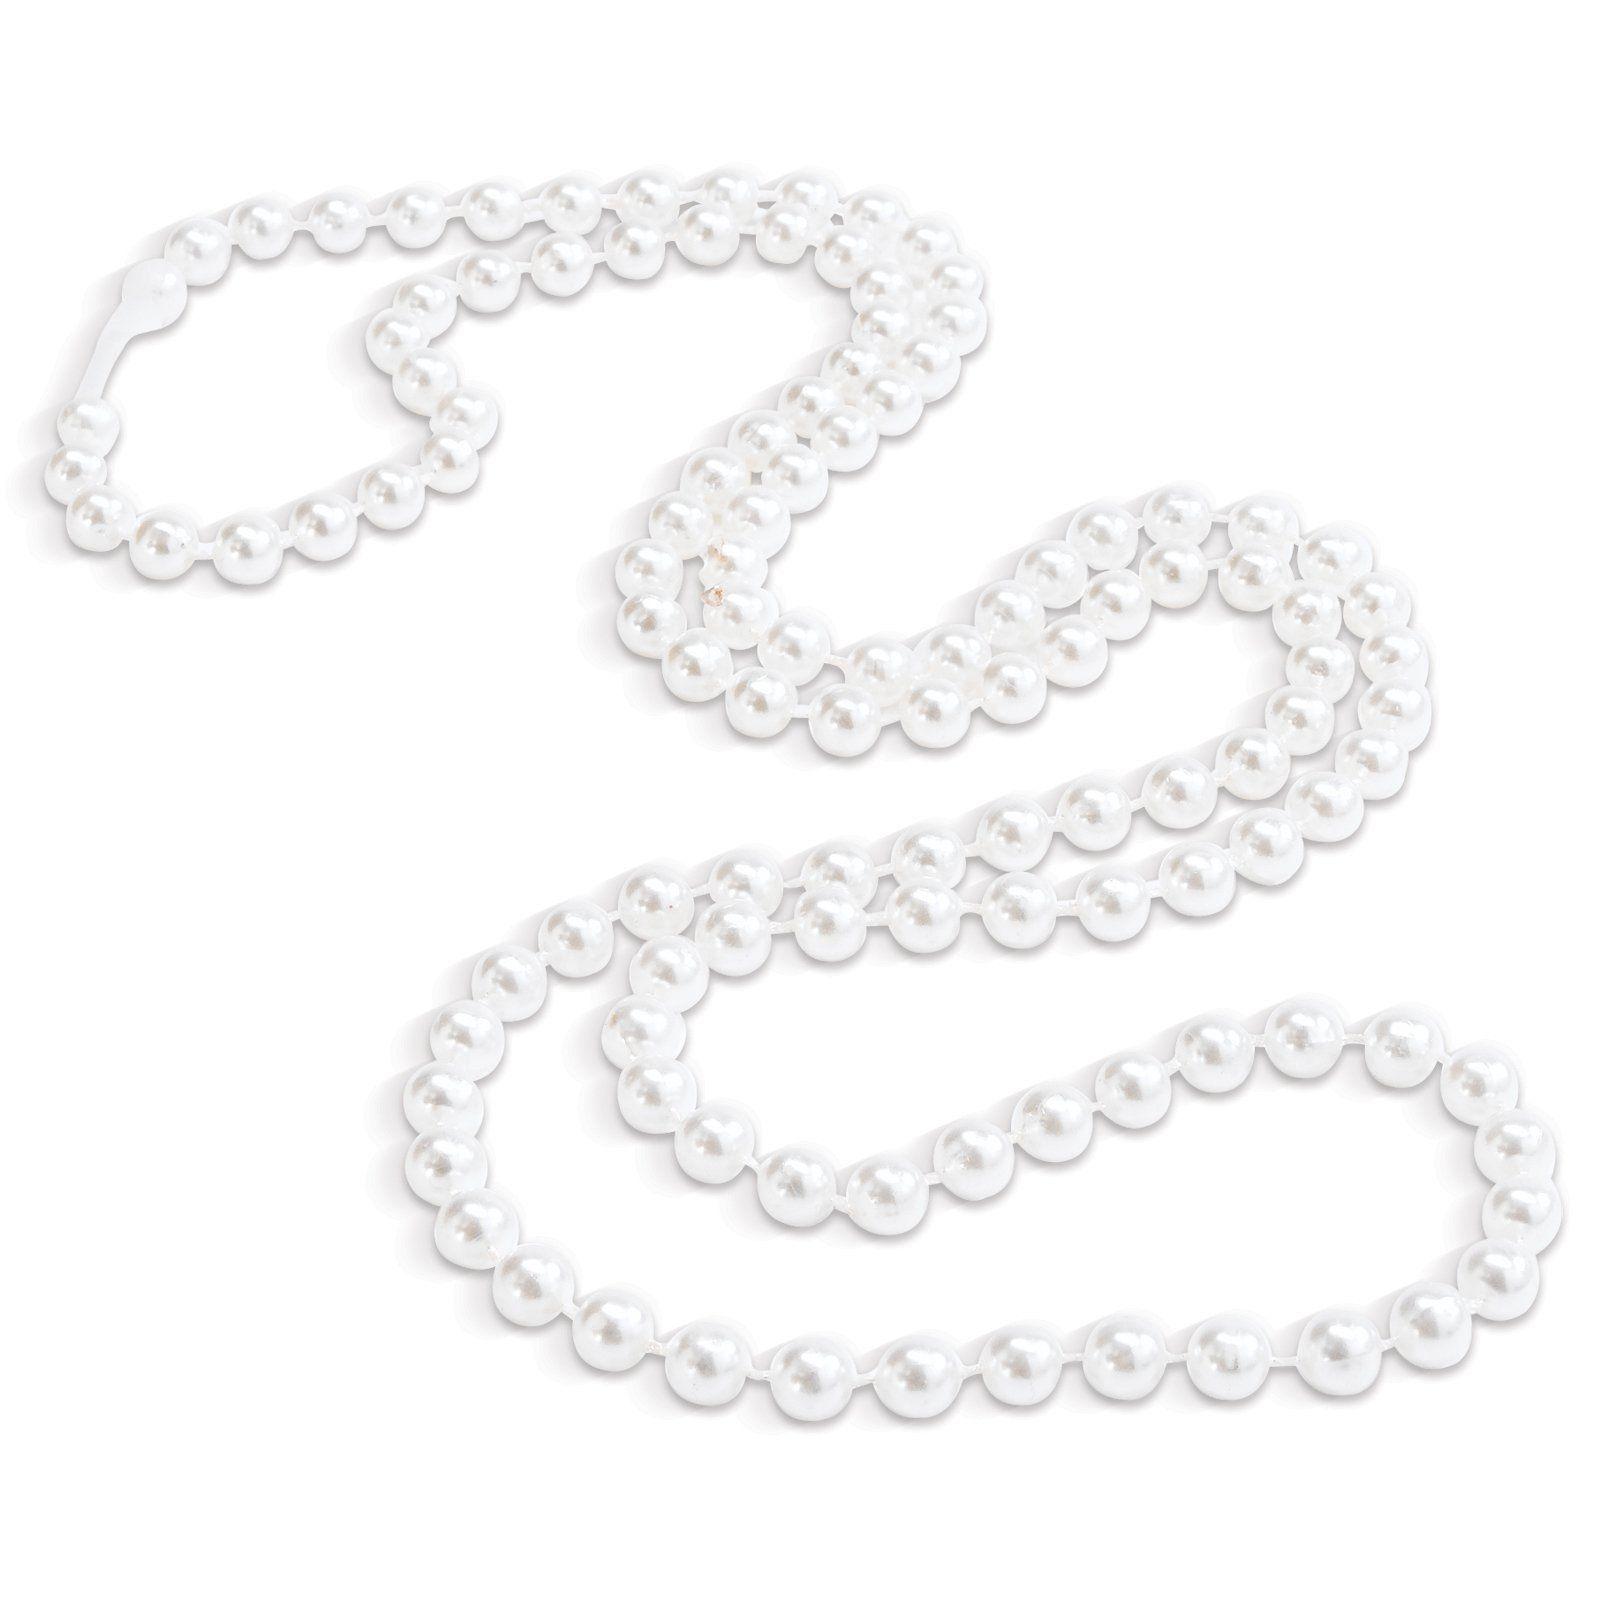 Amazon.com: Faux-Pearl Necklaces Party Accessory (8